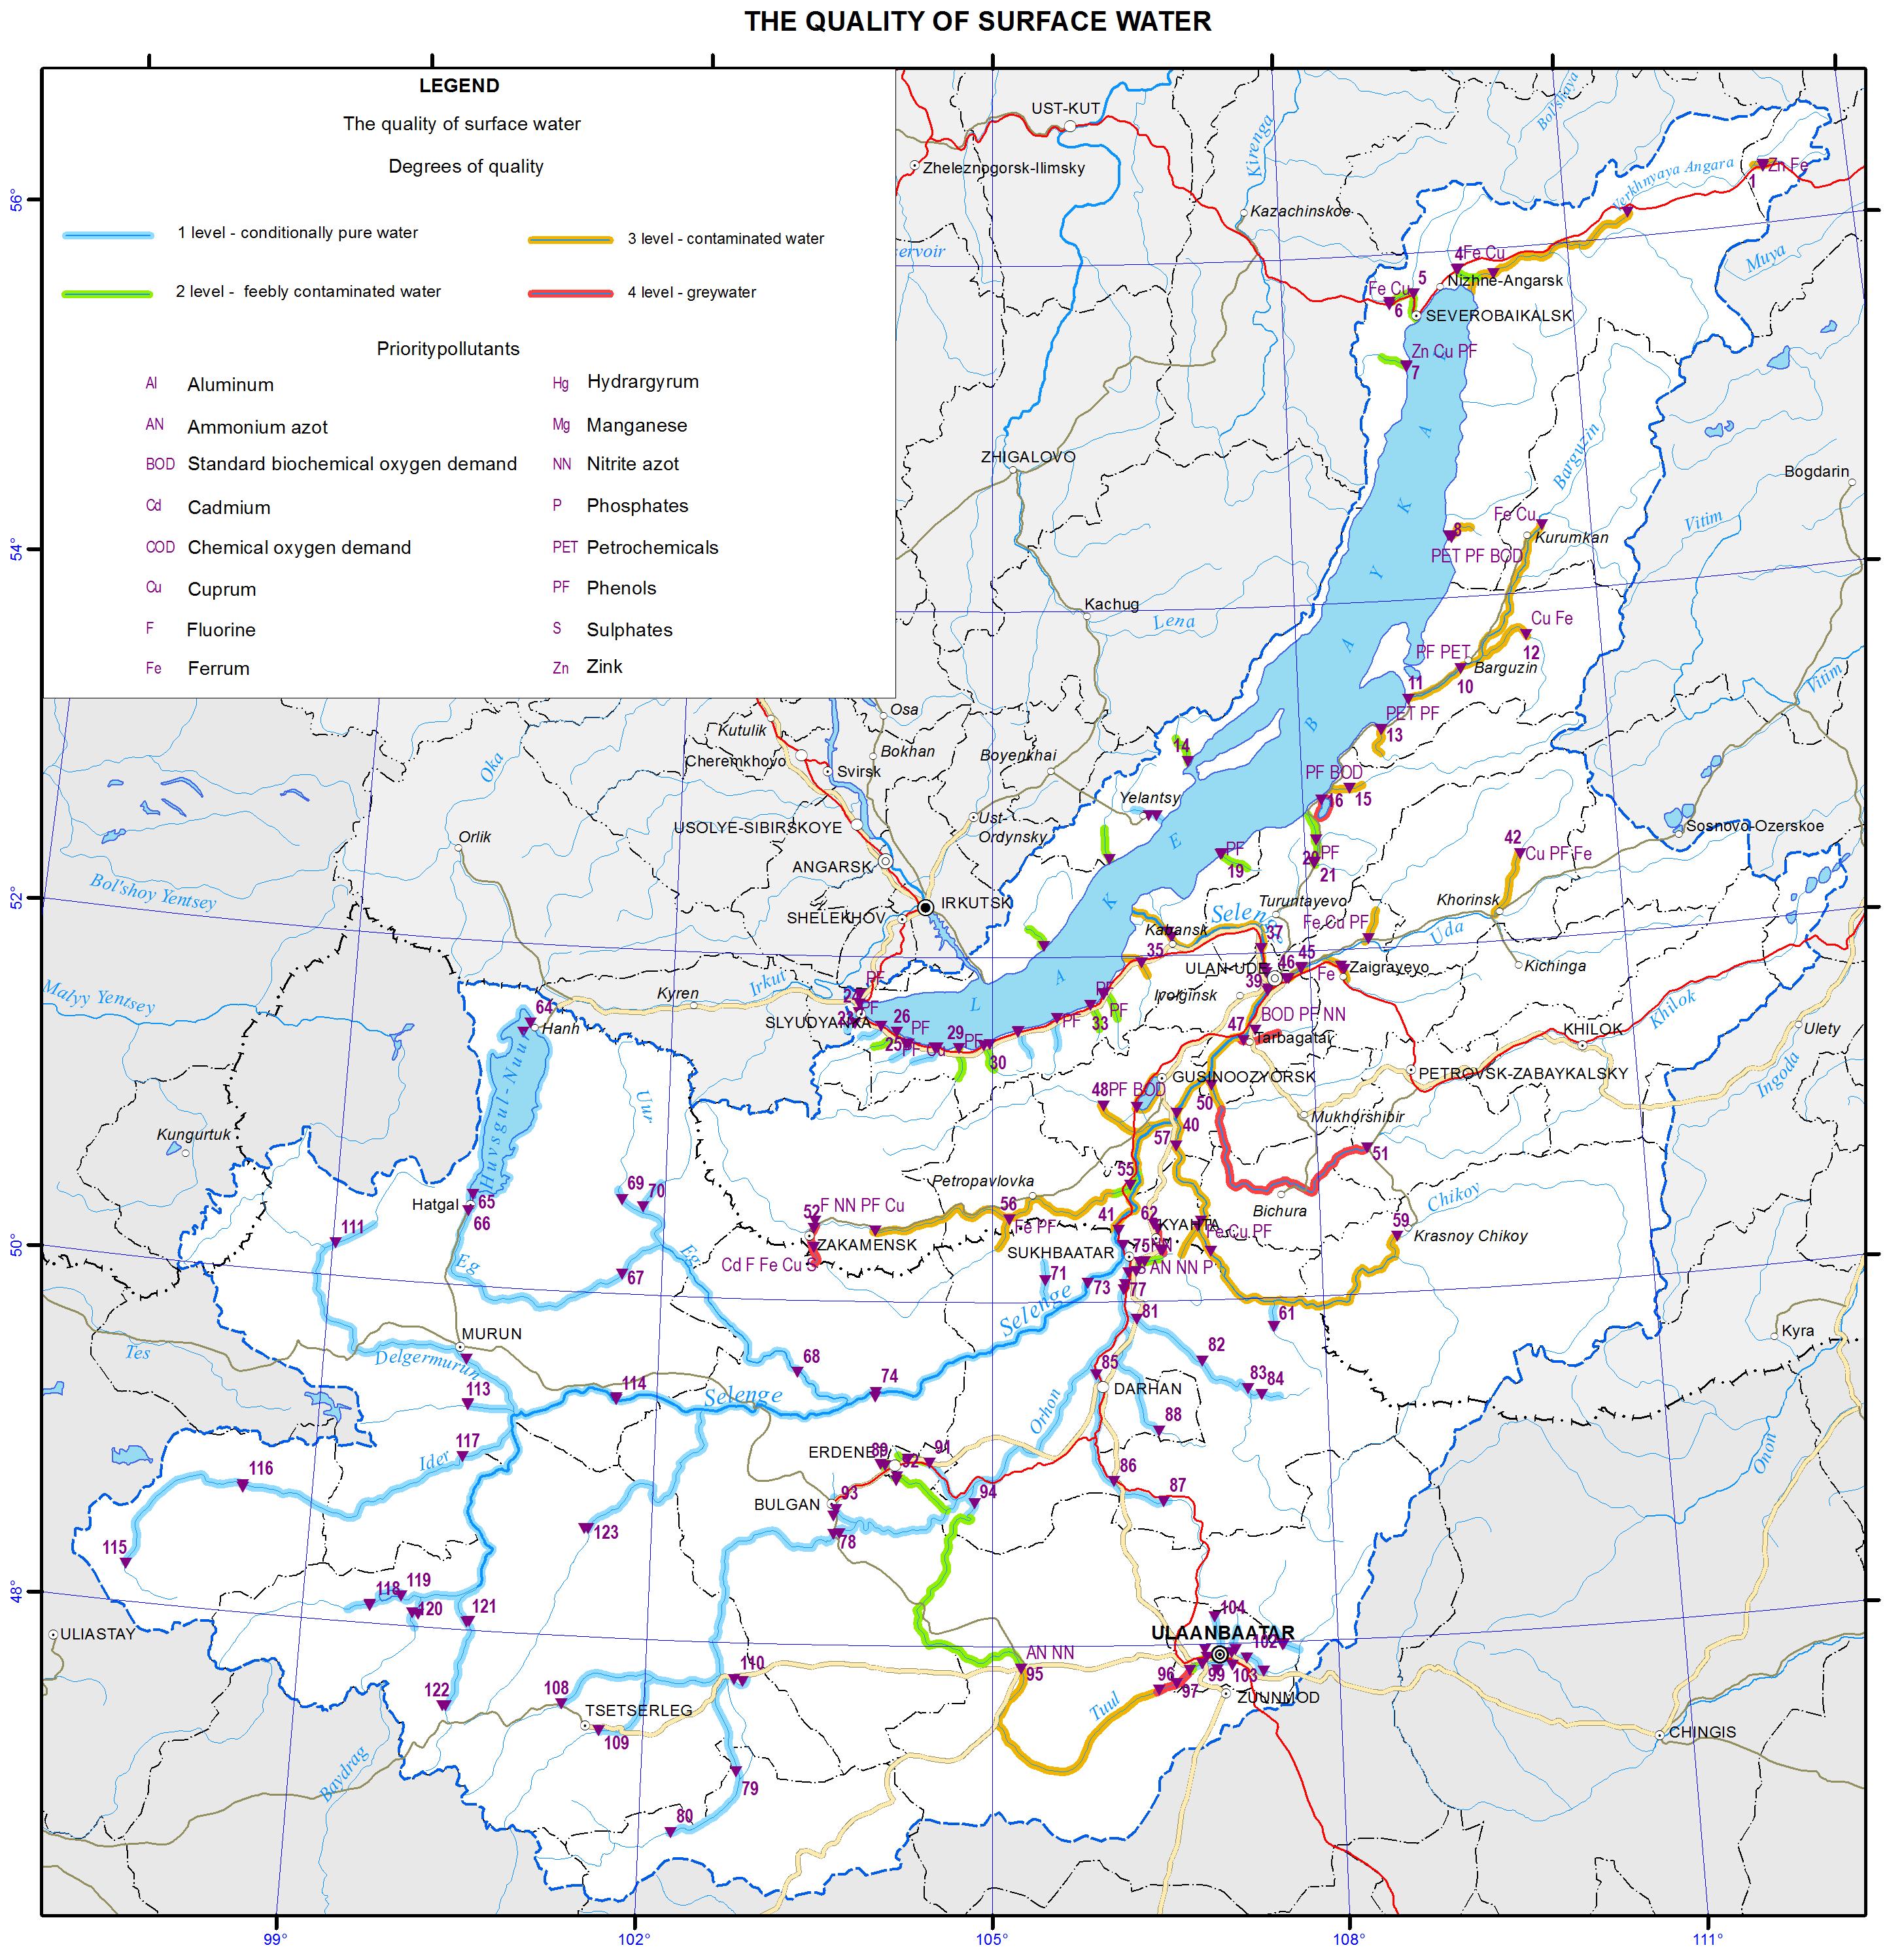 The Selenga River (Lake Baikal Basin): description, tributaries and interesting facts 29